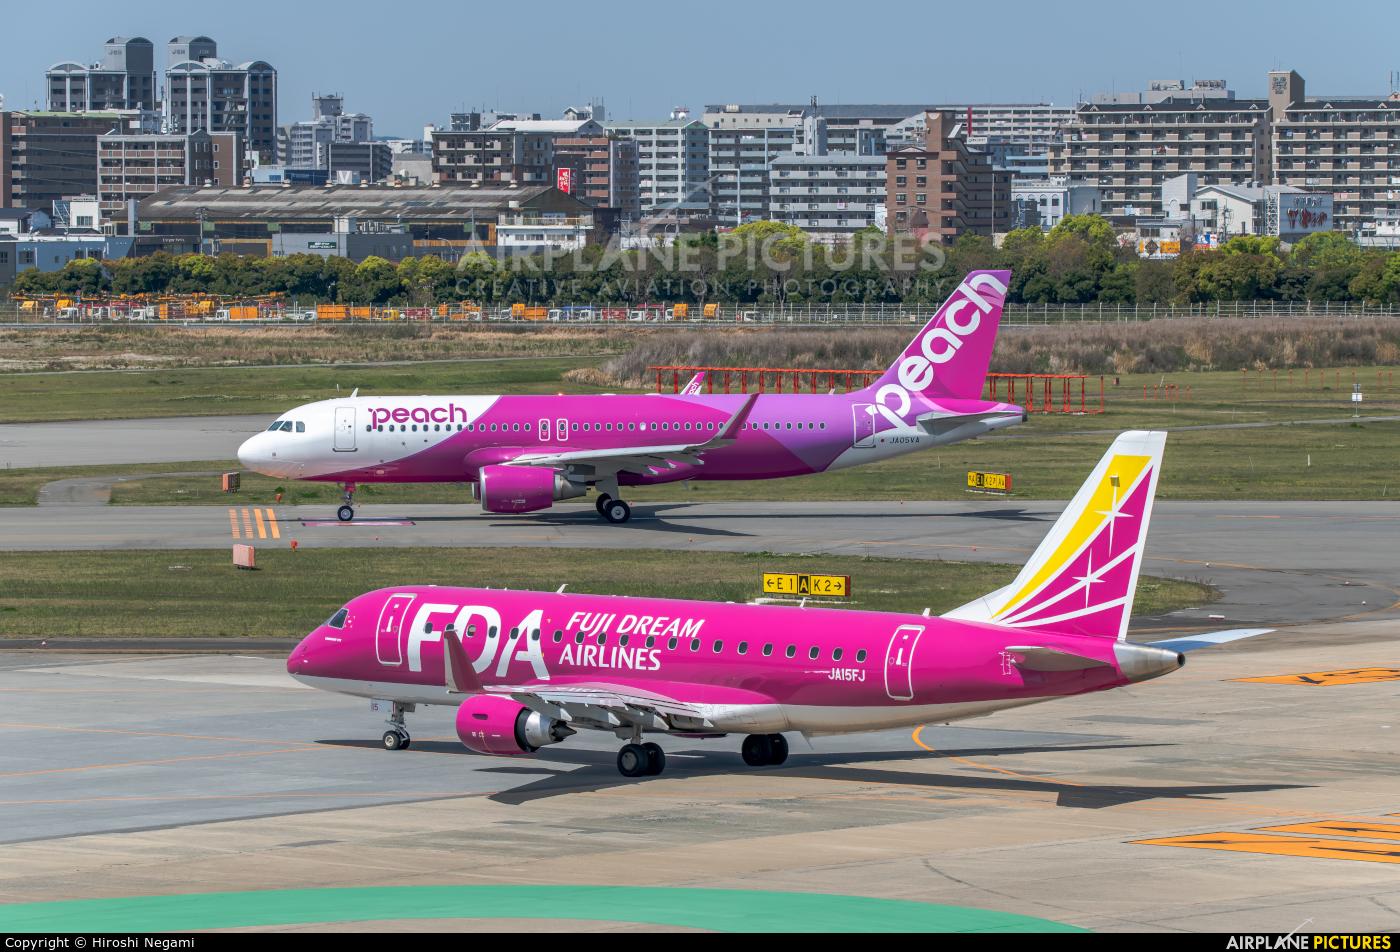 Fuji Dream Airlines JA15FJ aircraft at Fukuoka